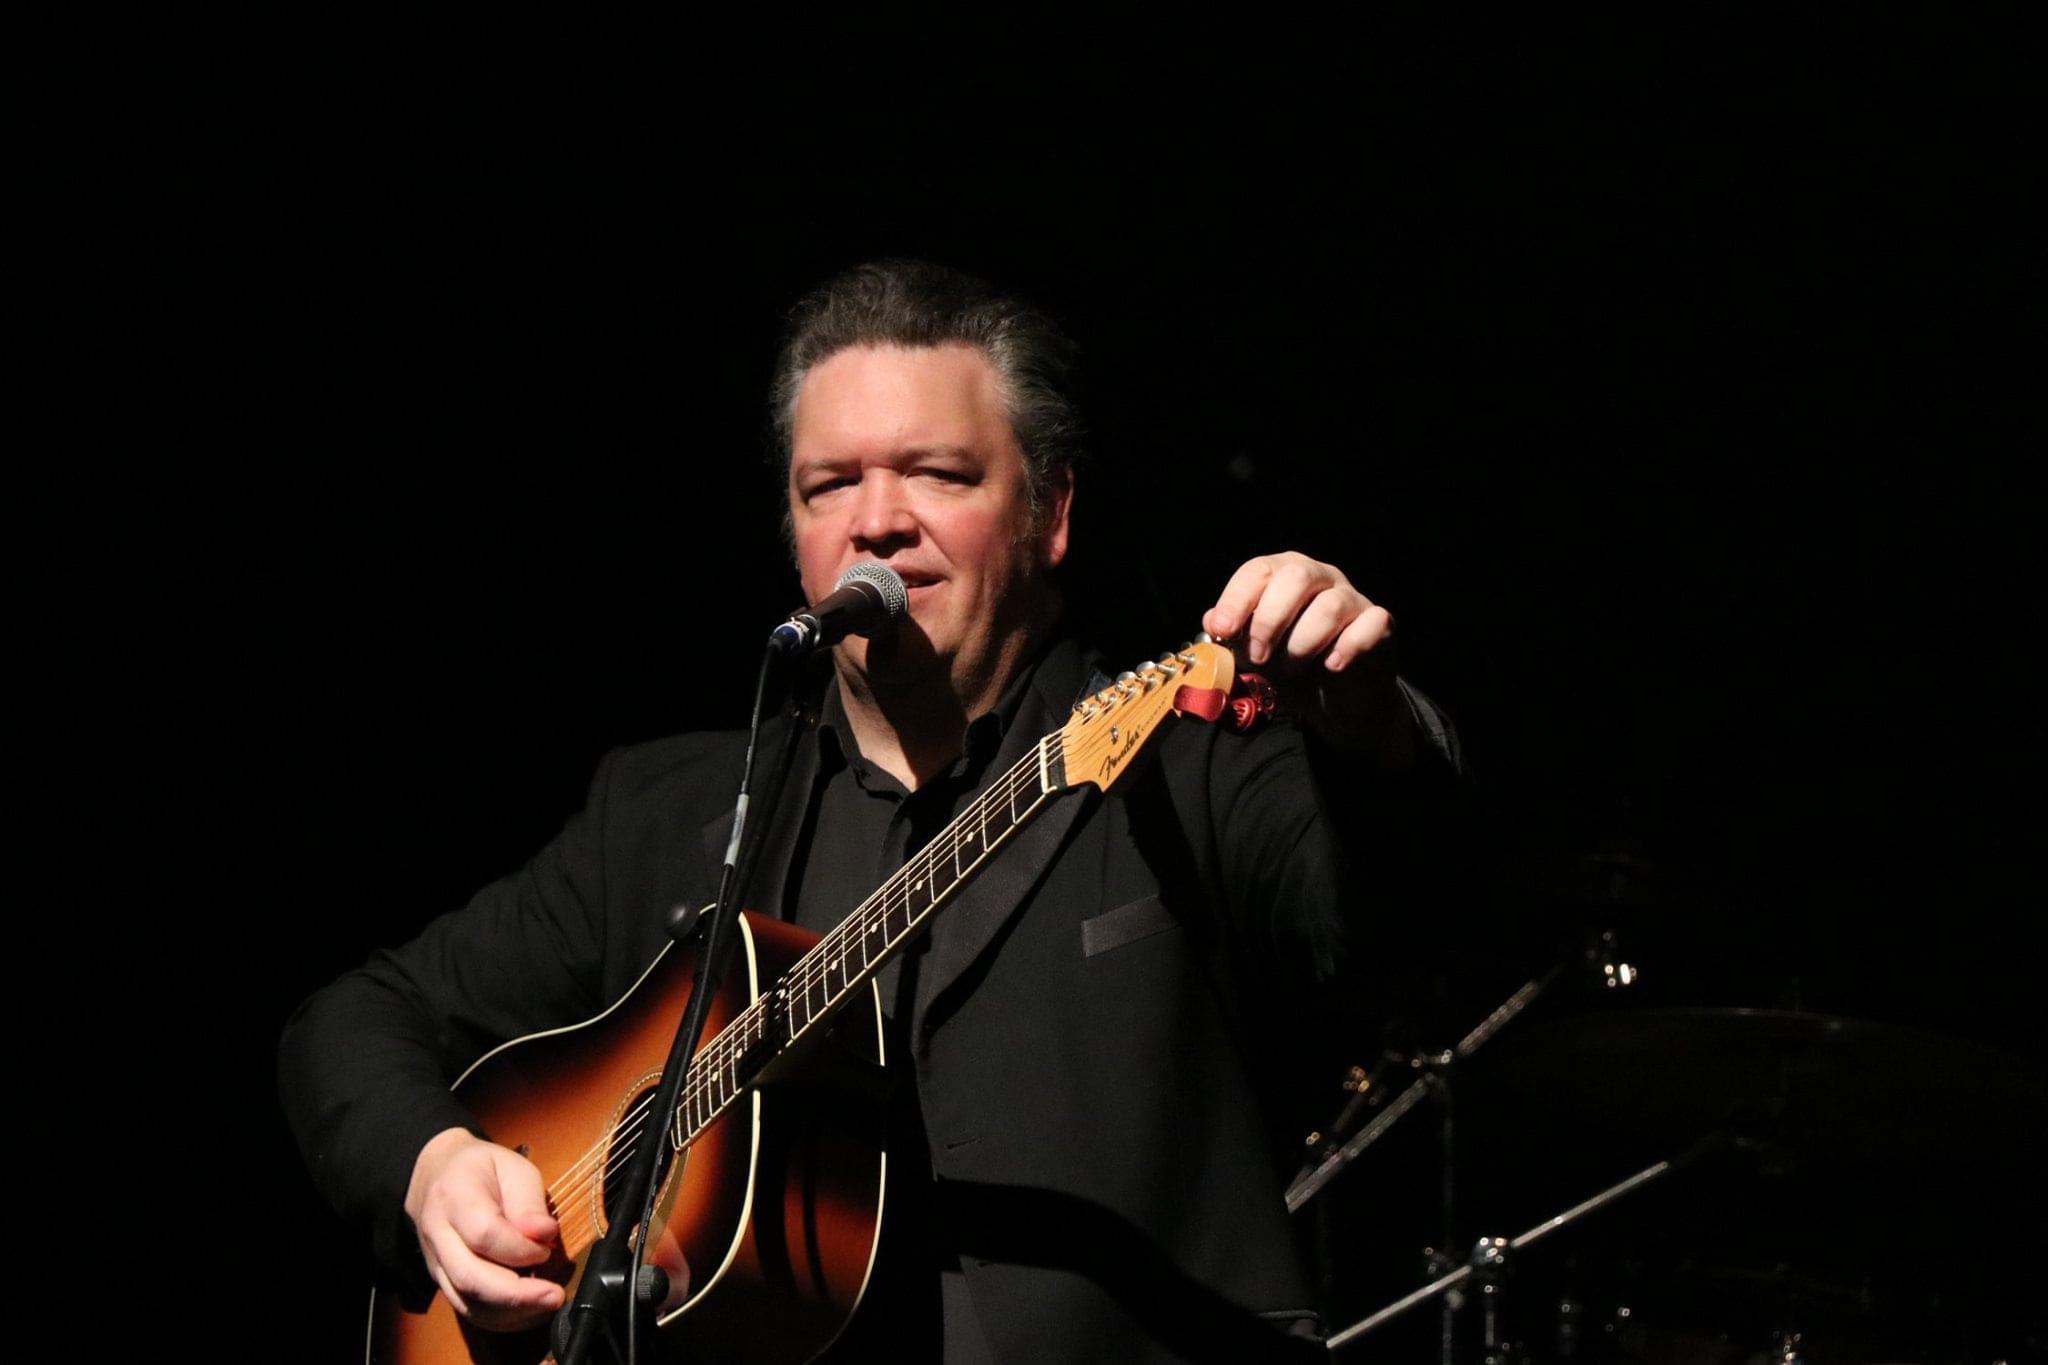 The Johnny Cash Show to tour Australia